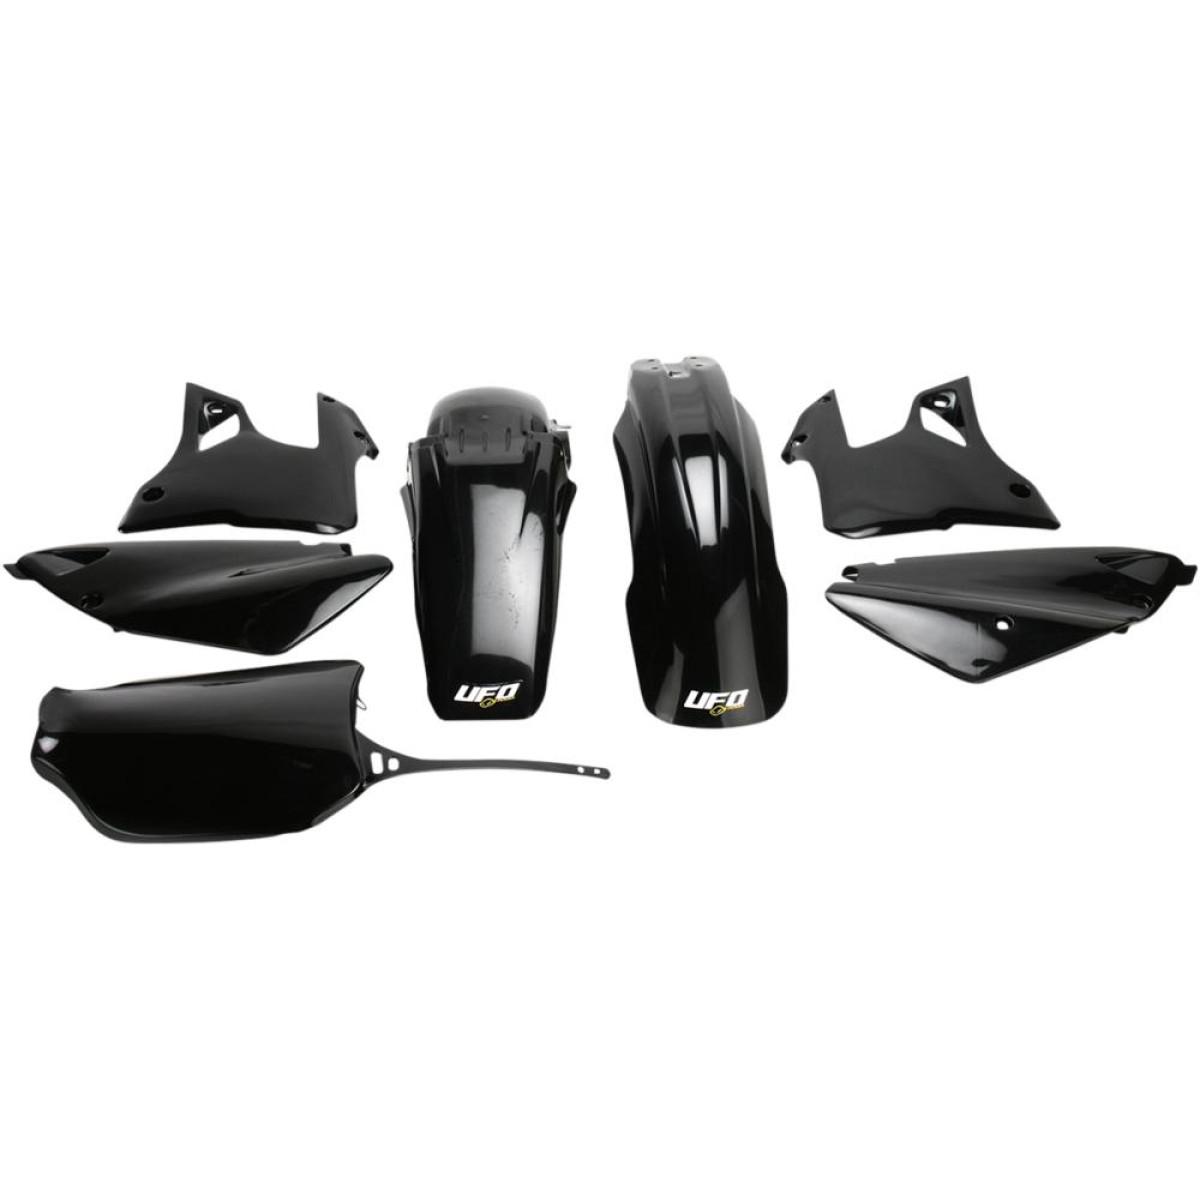 Kit plastique UFO Yamaha 125 YZ 00-01 noir